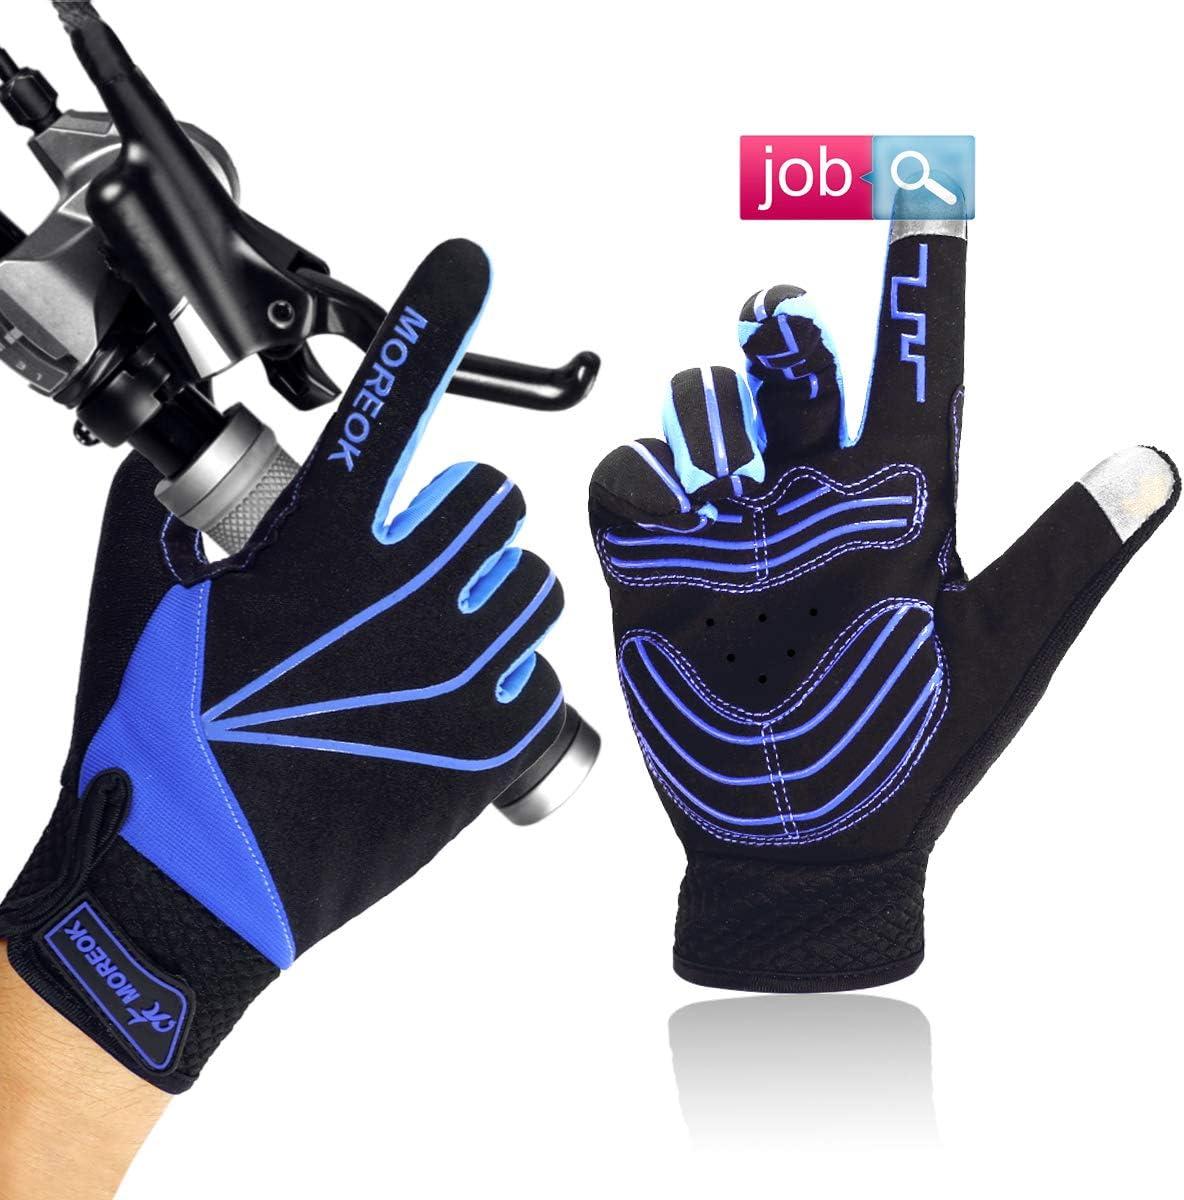 Bicycle Bike Gloves Fingerless Gel Padded Ultra Light Glove Black Unisex Adult